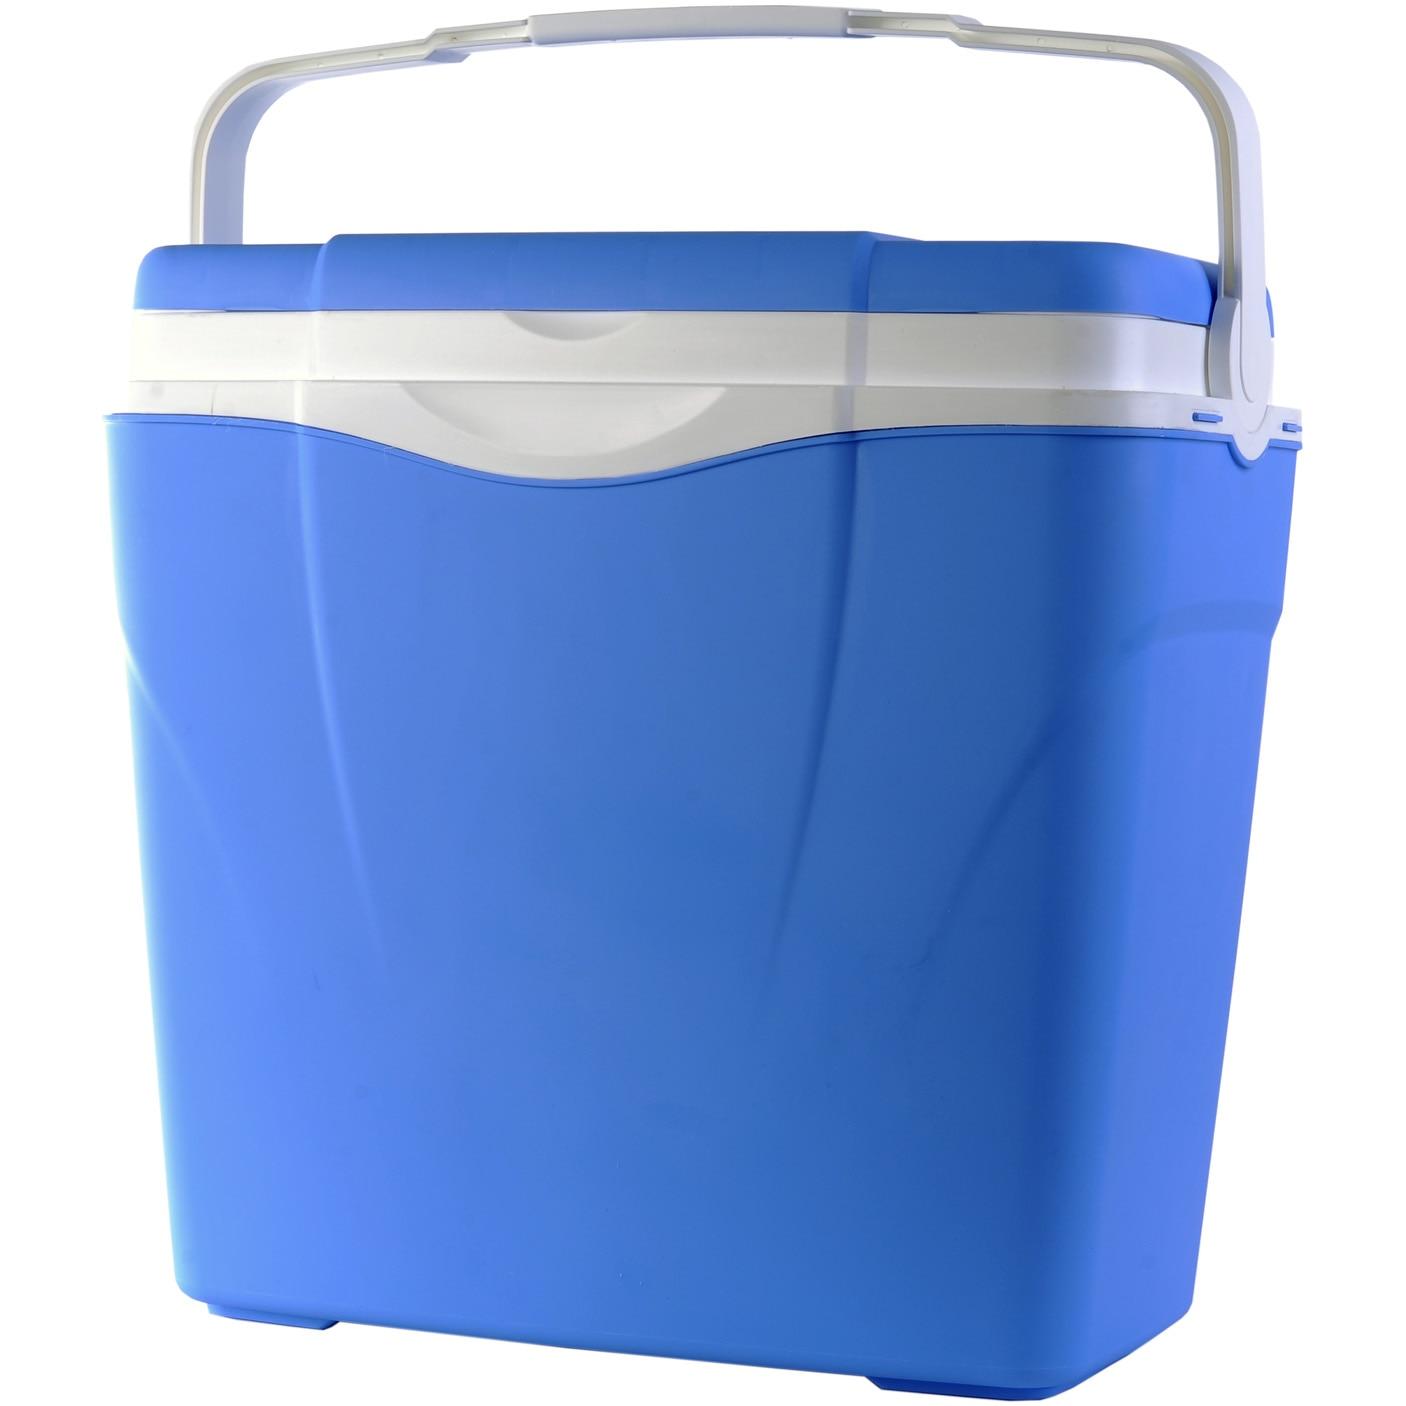 Fotografie Lada frigorifica pasiva Antartica, 24 litri, blue